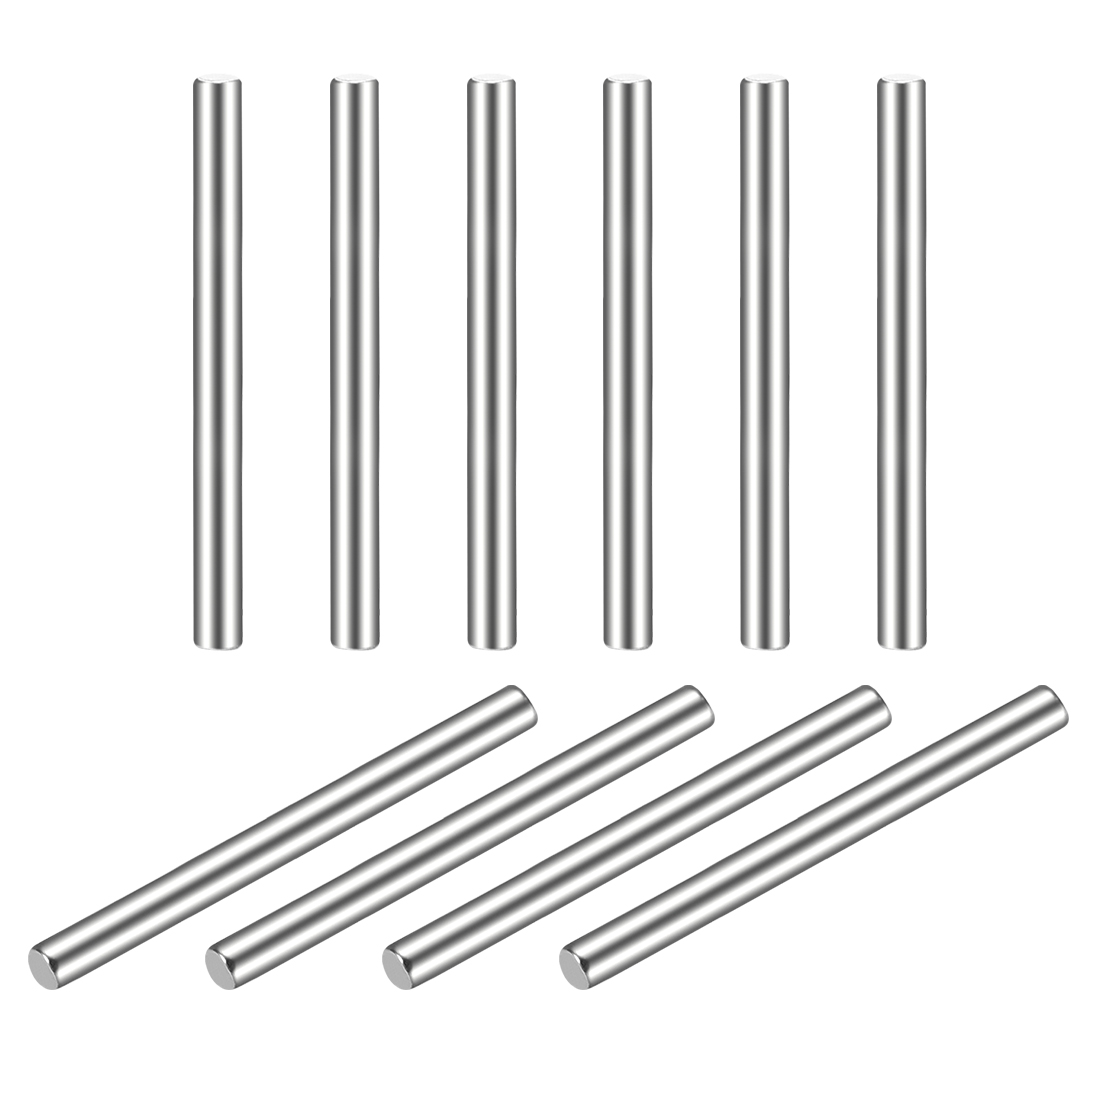 10Pcs 2mm x 25mm Dowel Pin 304 Stainless Steel Shelf Support Pin Fasten